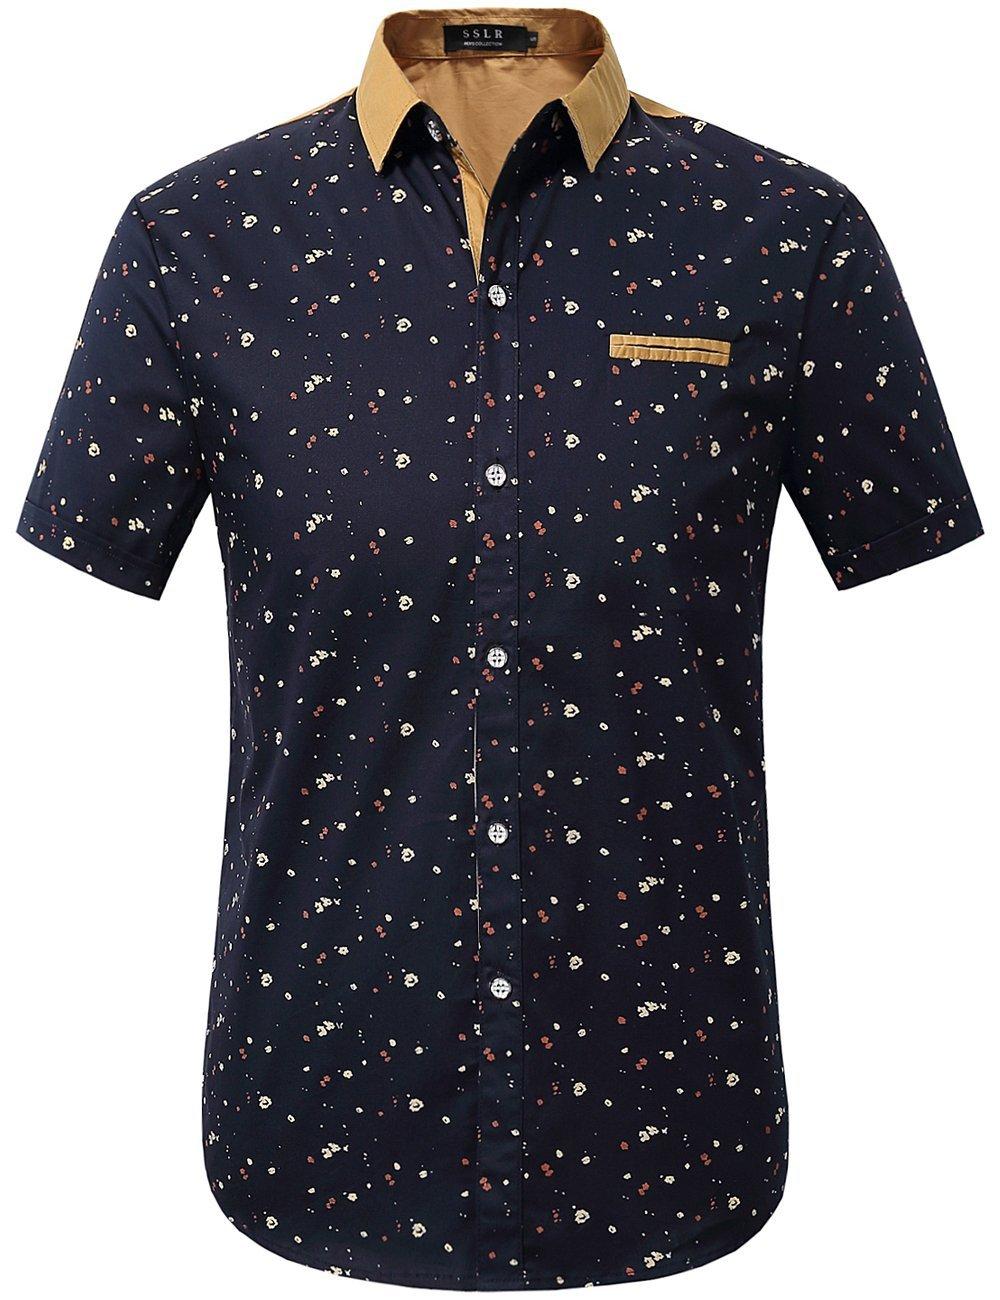 SSLR Men's Printing Pattern Button Down Casual Short Sleeve Shirts (X-Large, Blue)